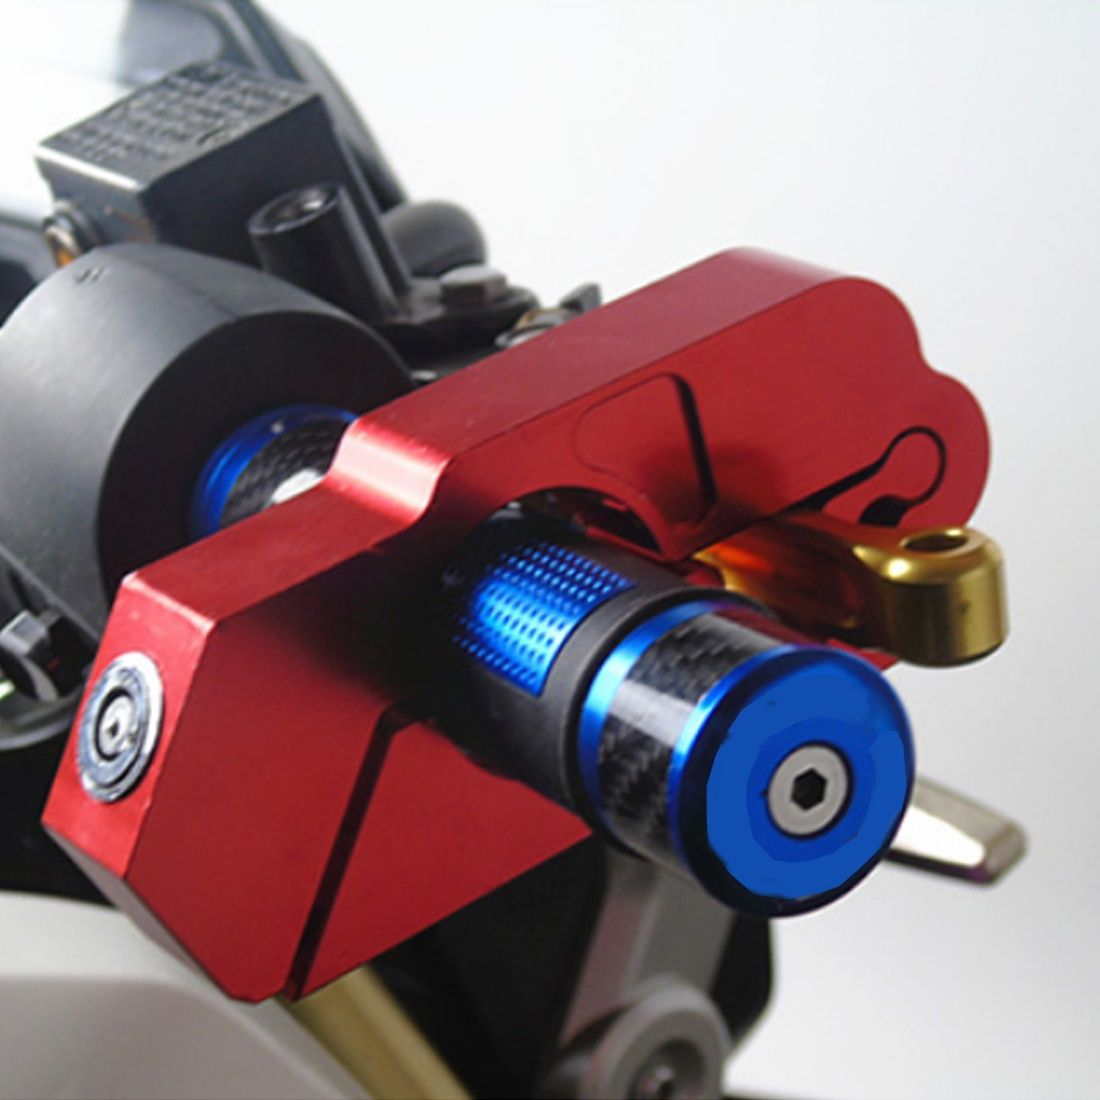 CAR-partment Motorcycle Handlebar Lock <font><b>Scooter</b></font> ATV Brake Clutch Security Safety Theft Protection Locks for Honda Yamaha Piaggio